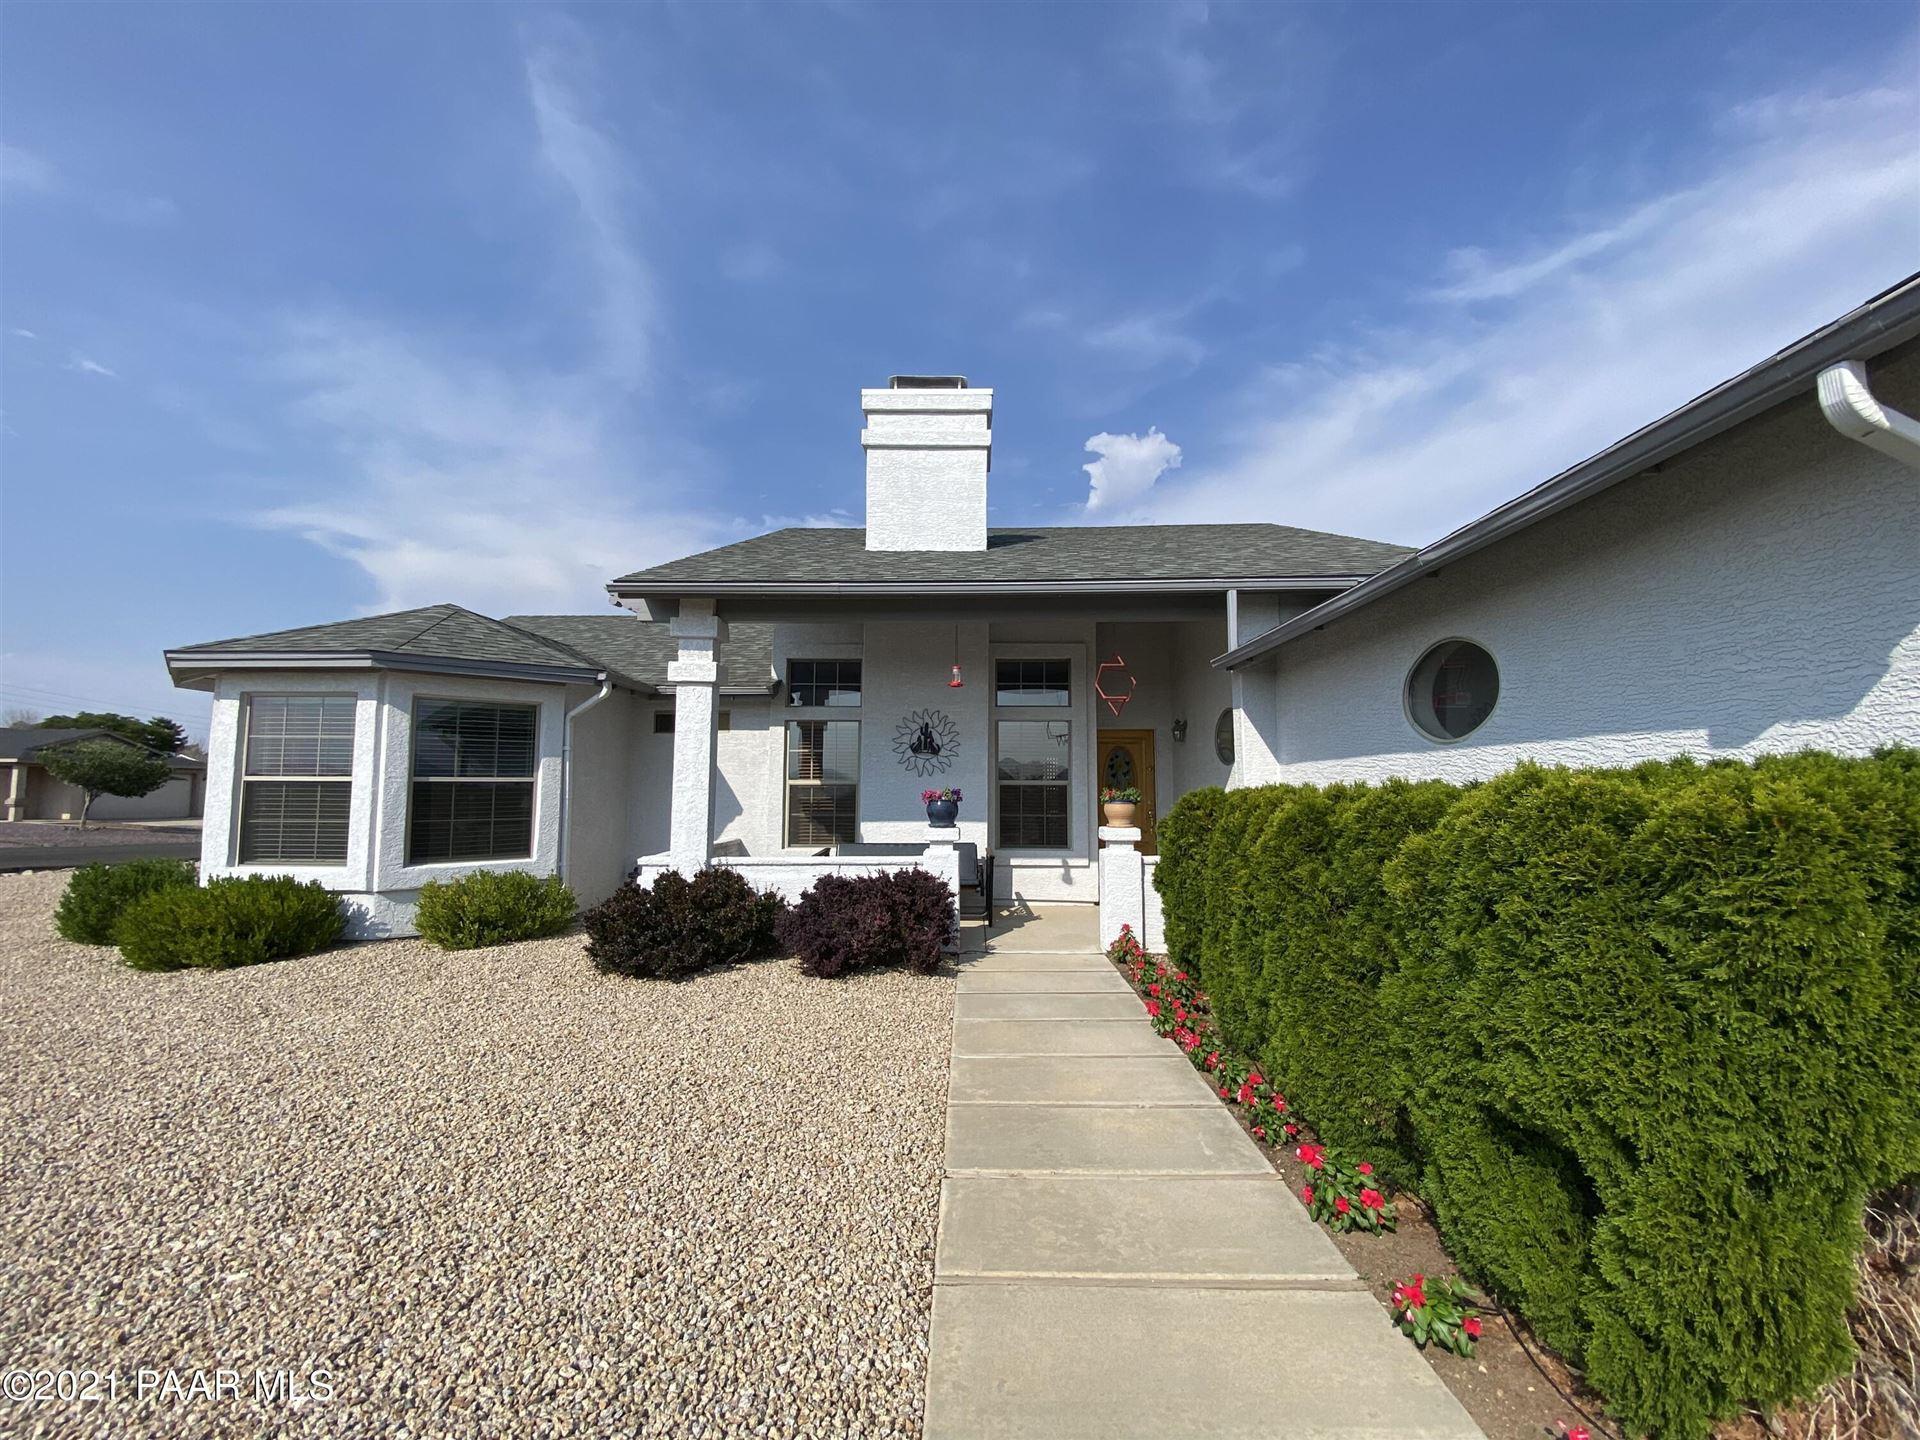 Photo of 6105 Winchester Drive #Lot: 4890, Prescott Valley, AZ 86314 (MLS # 1040420)